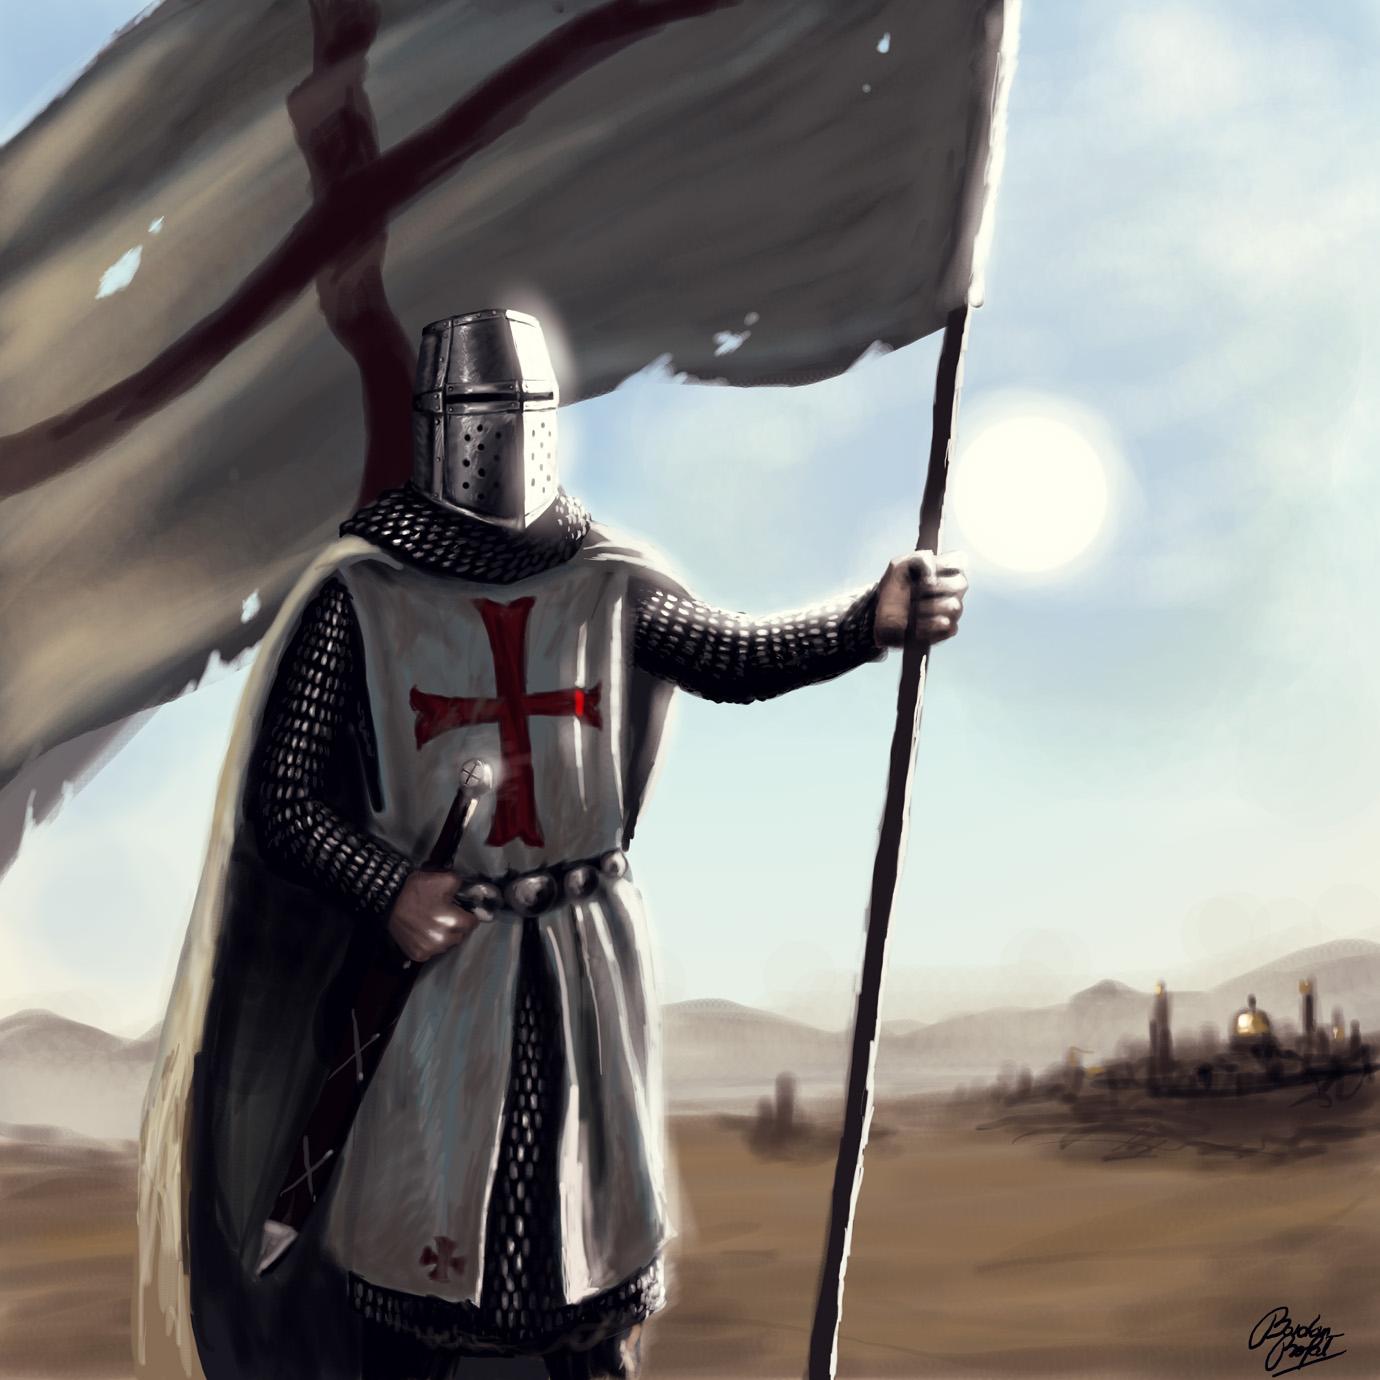 knight, рыцарь тамплиер, скачать фото, обои